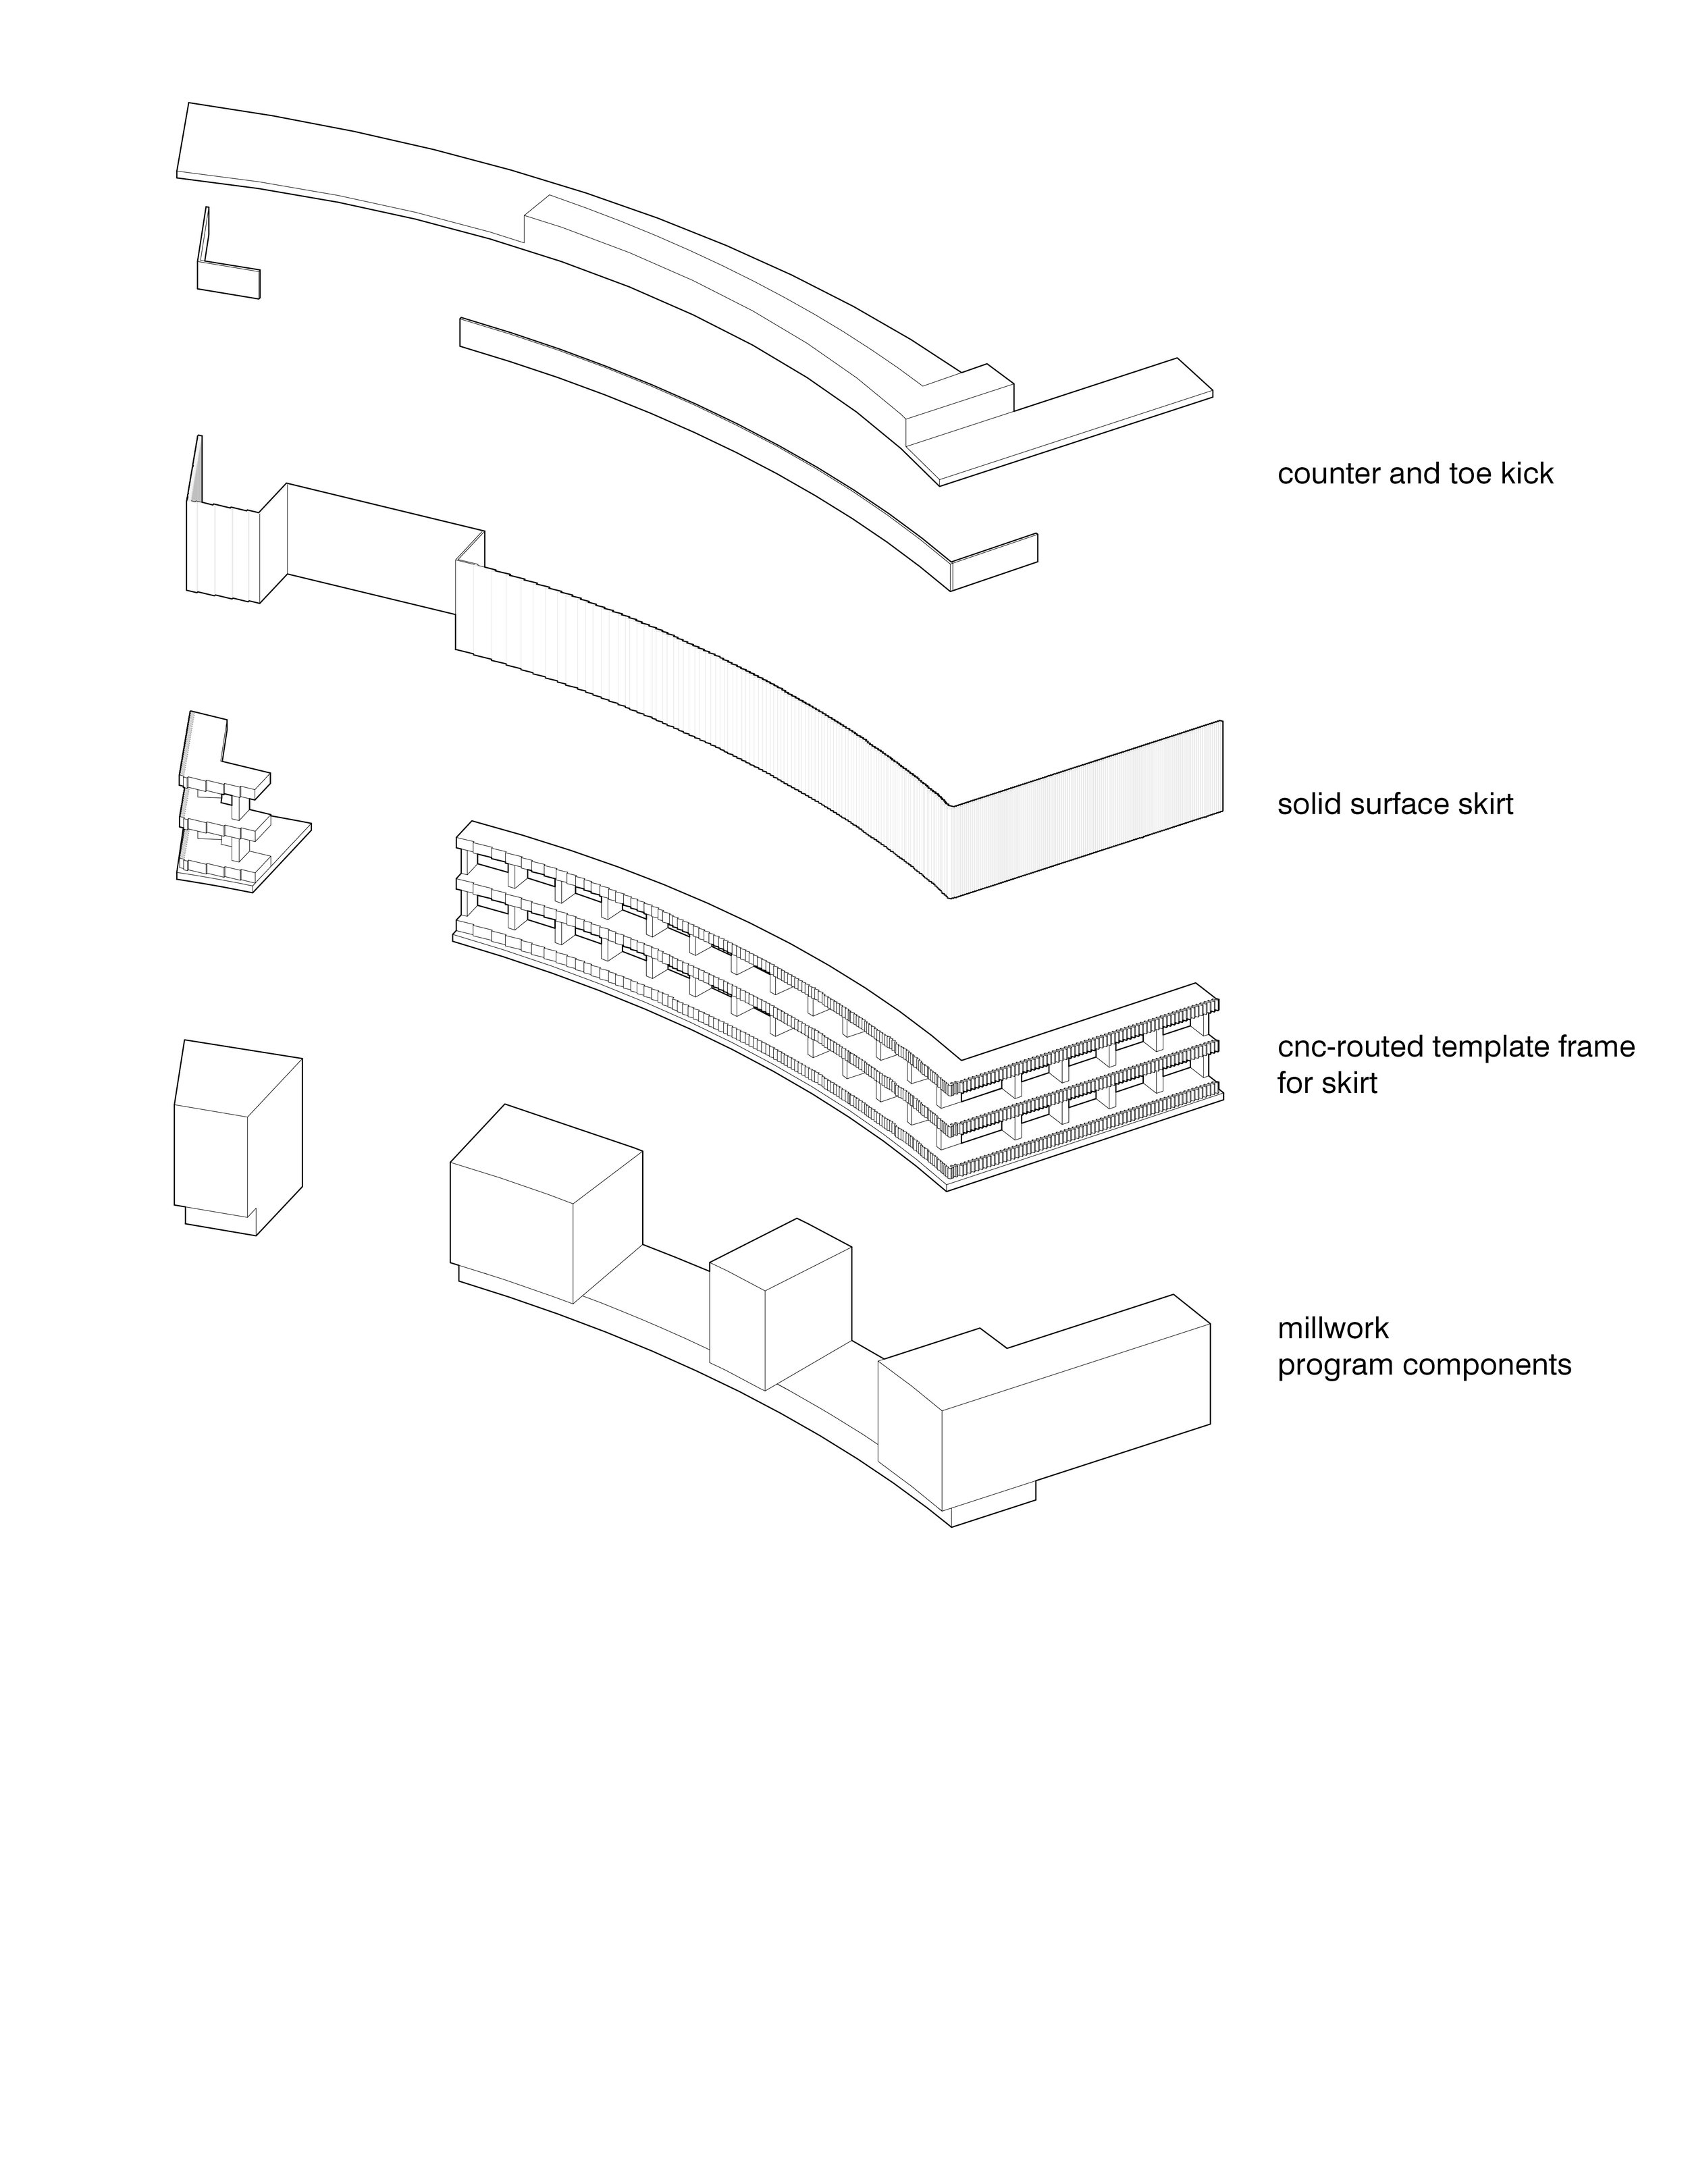 brooks diagram final.jpg